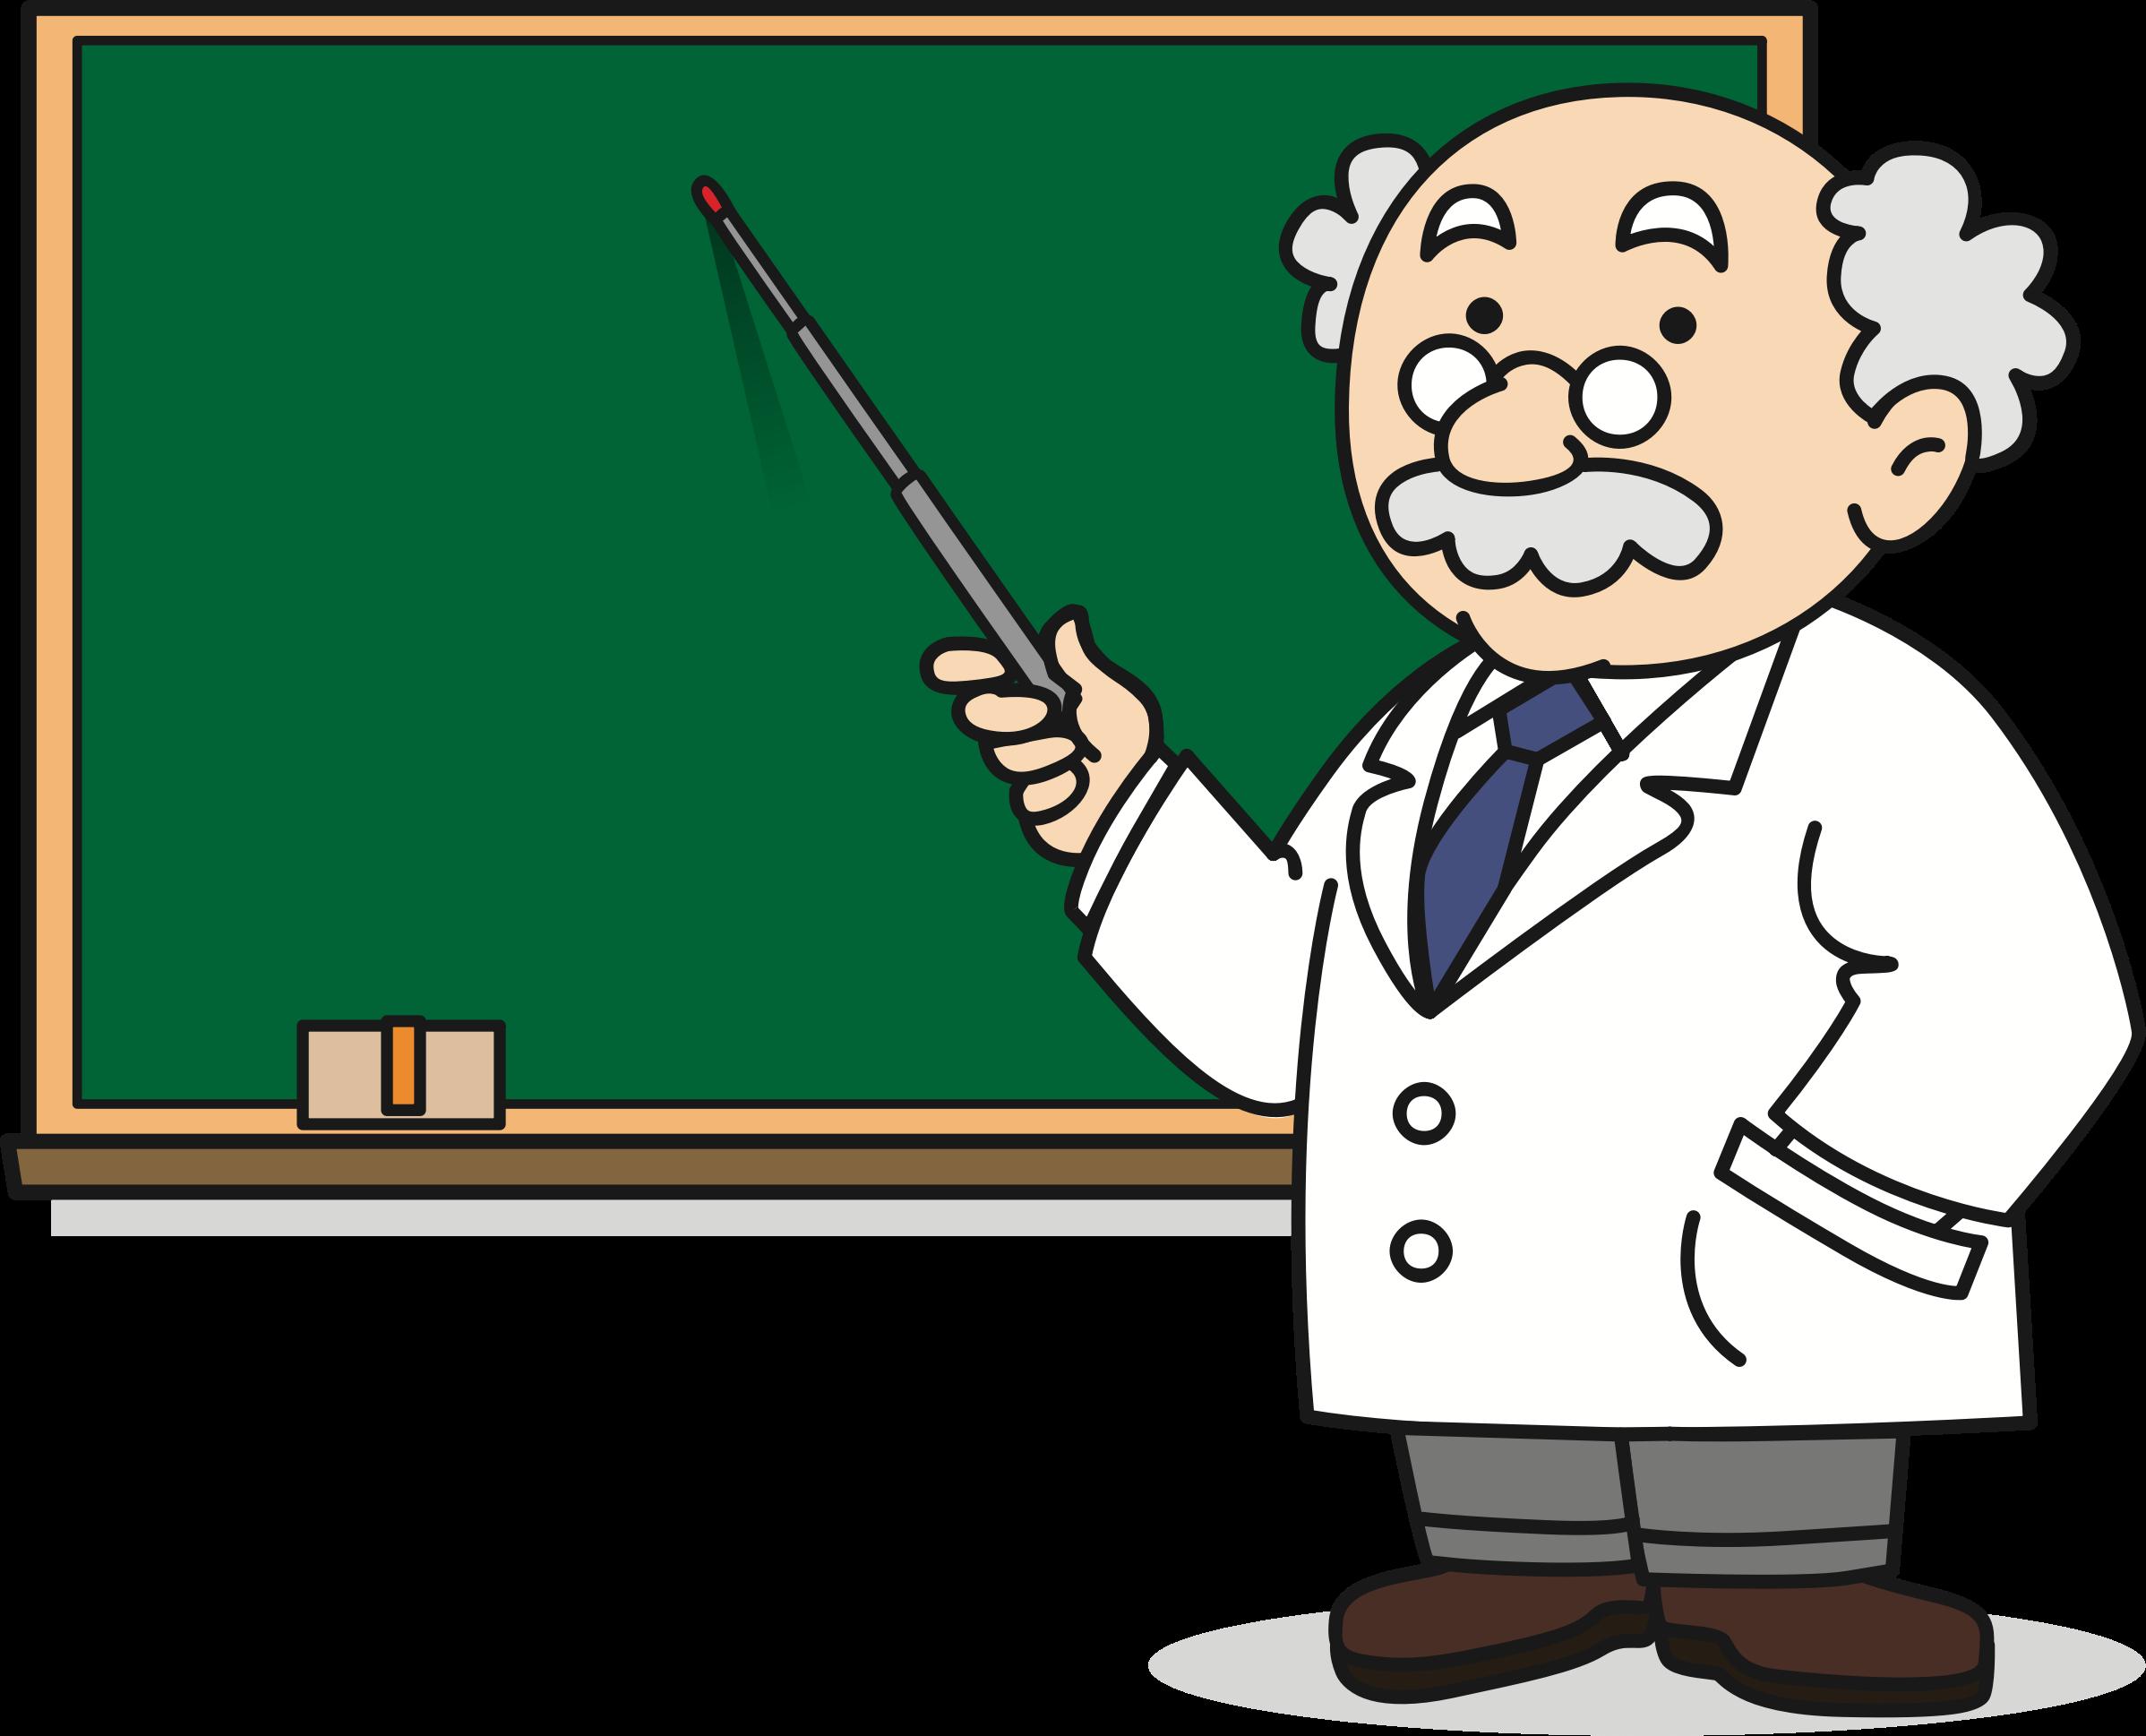 Teach clipart male professor, Teach male professor.